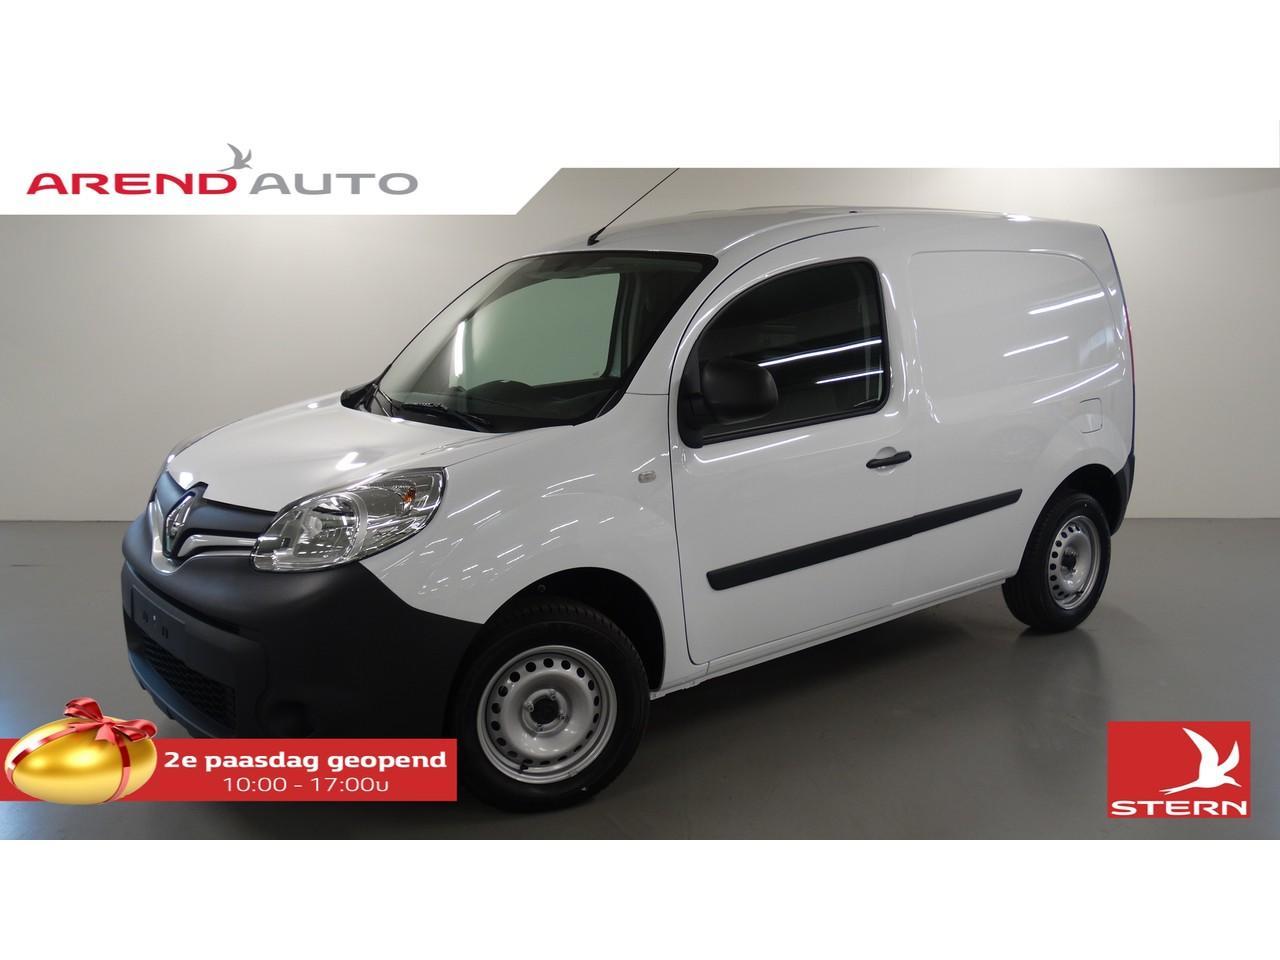 Renault Kangoo 75 pk comfort €4.127,20.- korting!